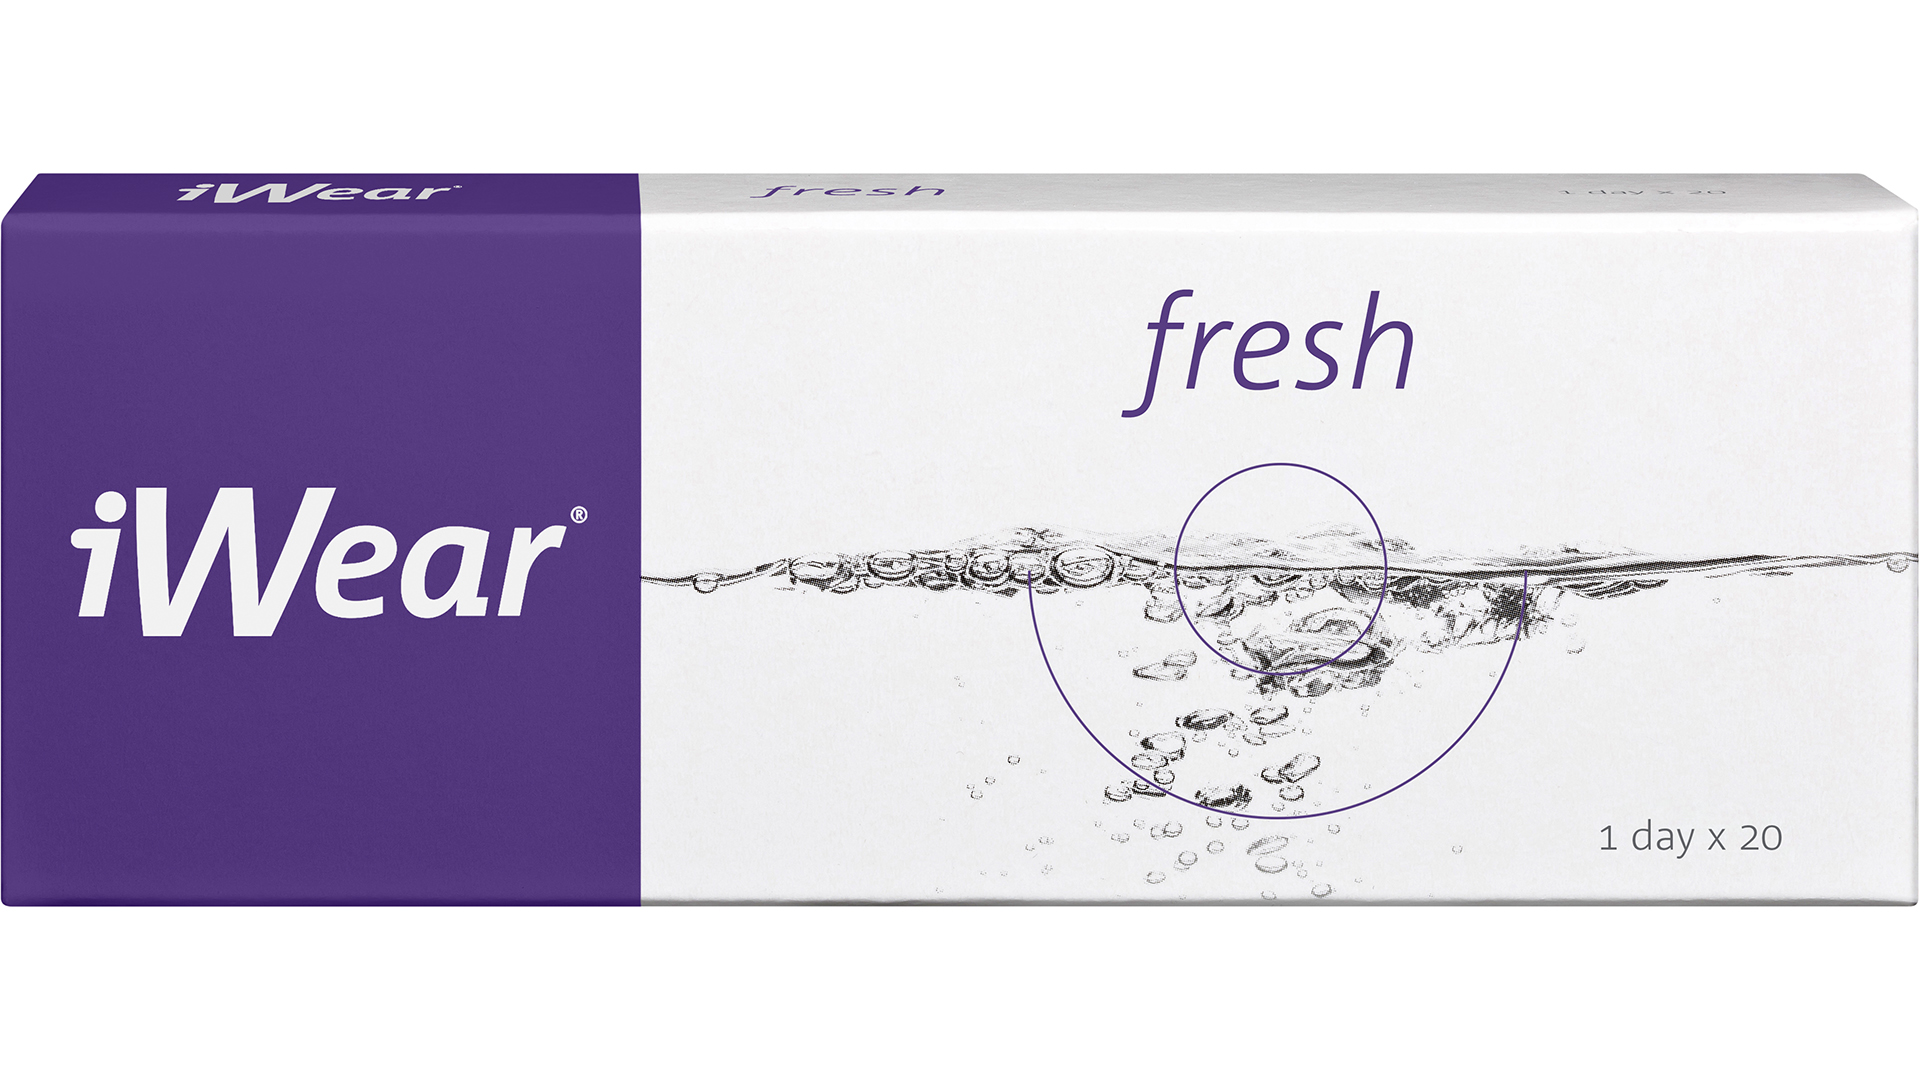 Front iWear fresh